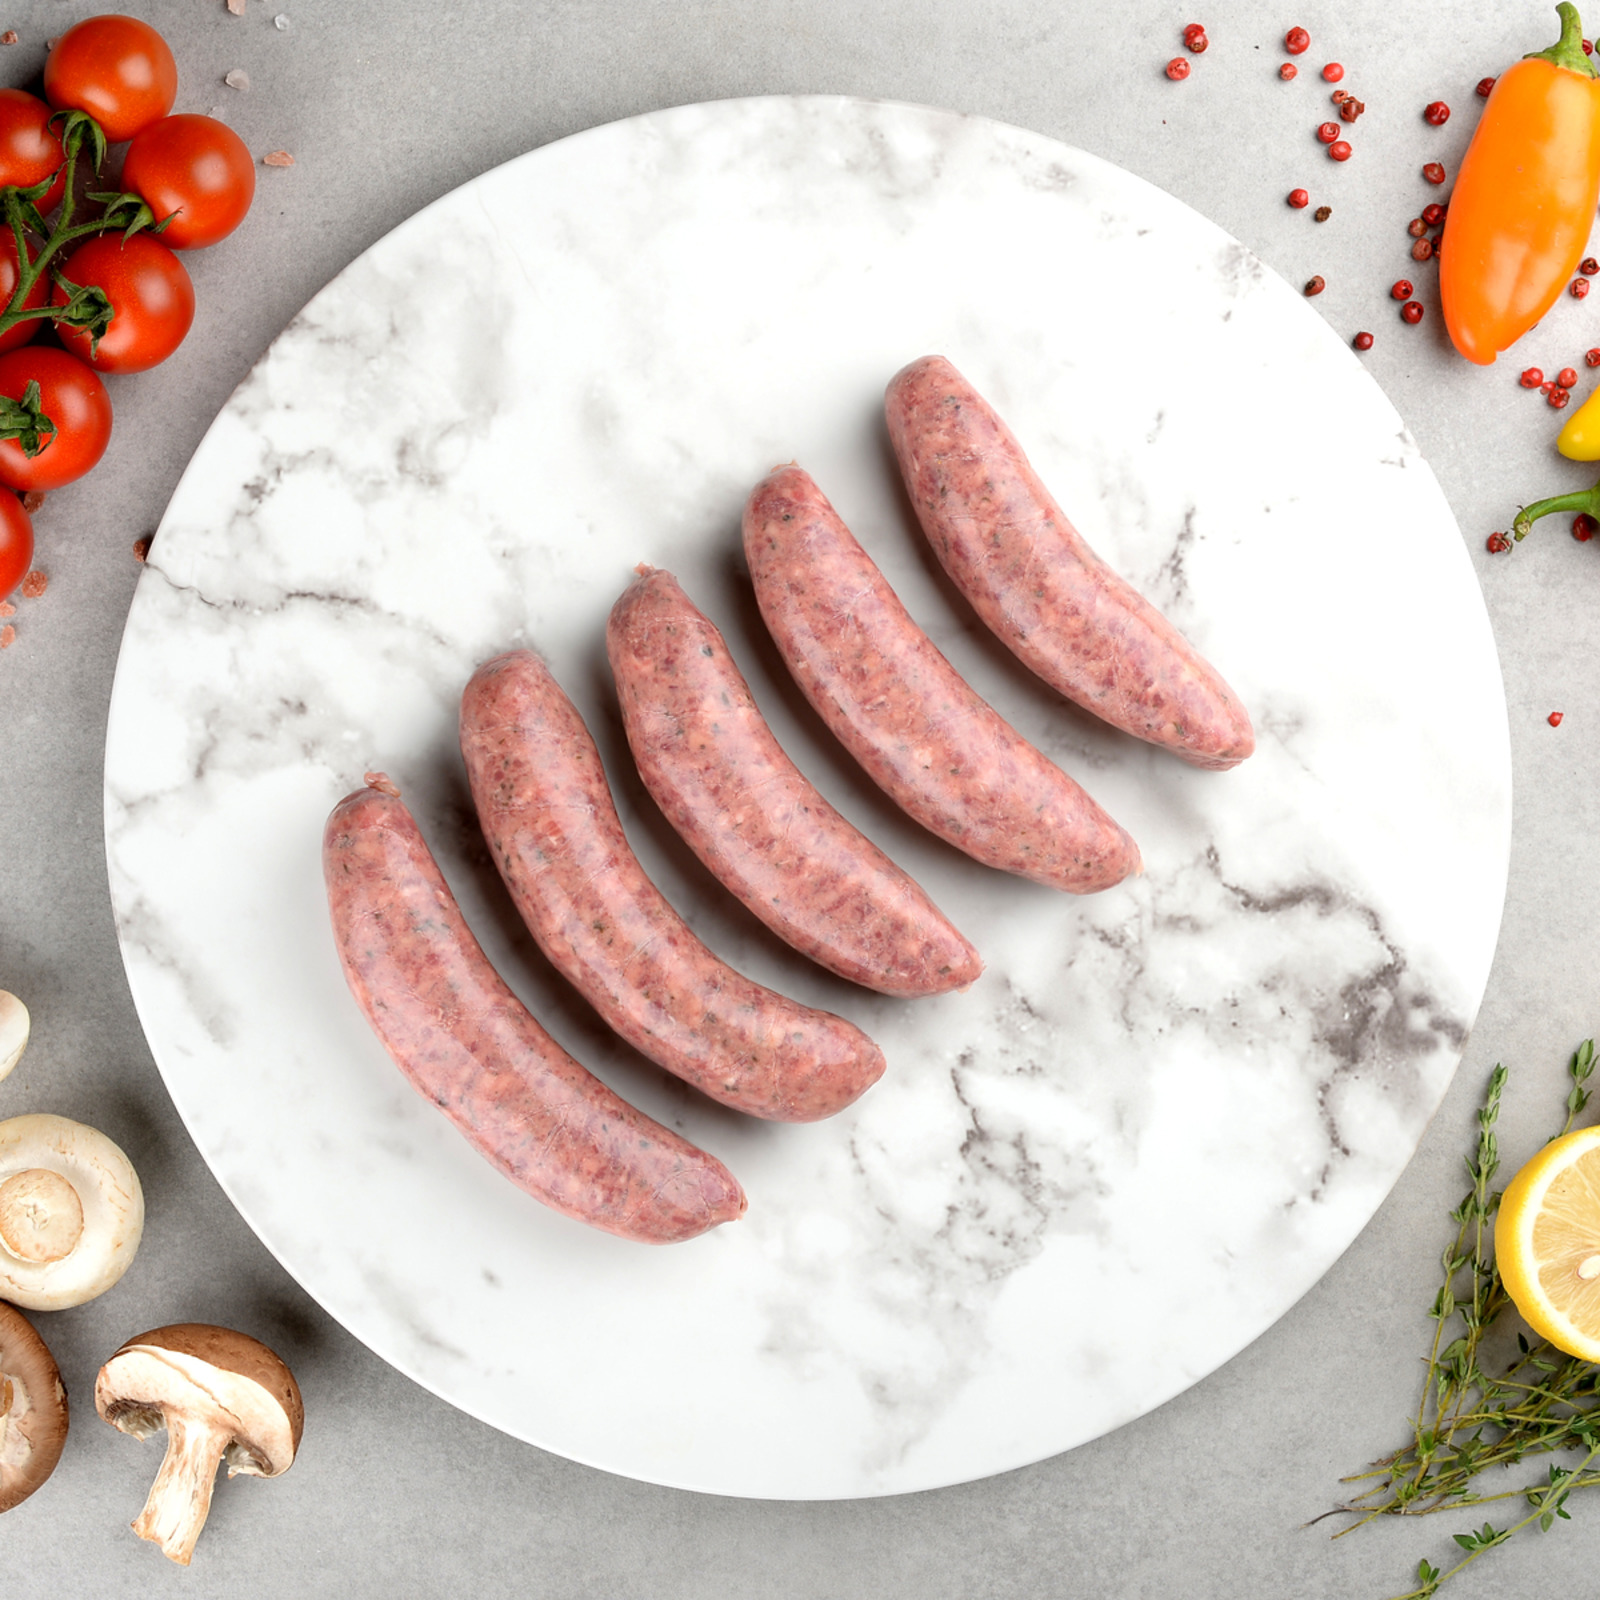 Ryan's Organic Beef Herb And Garlic Sausage (Frozen)